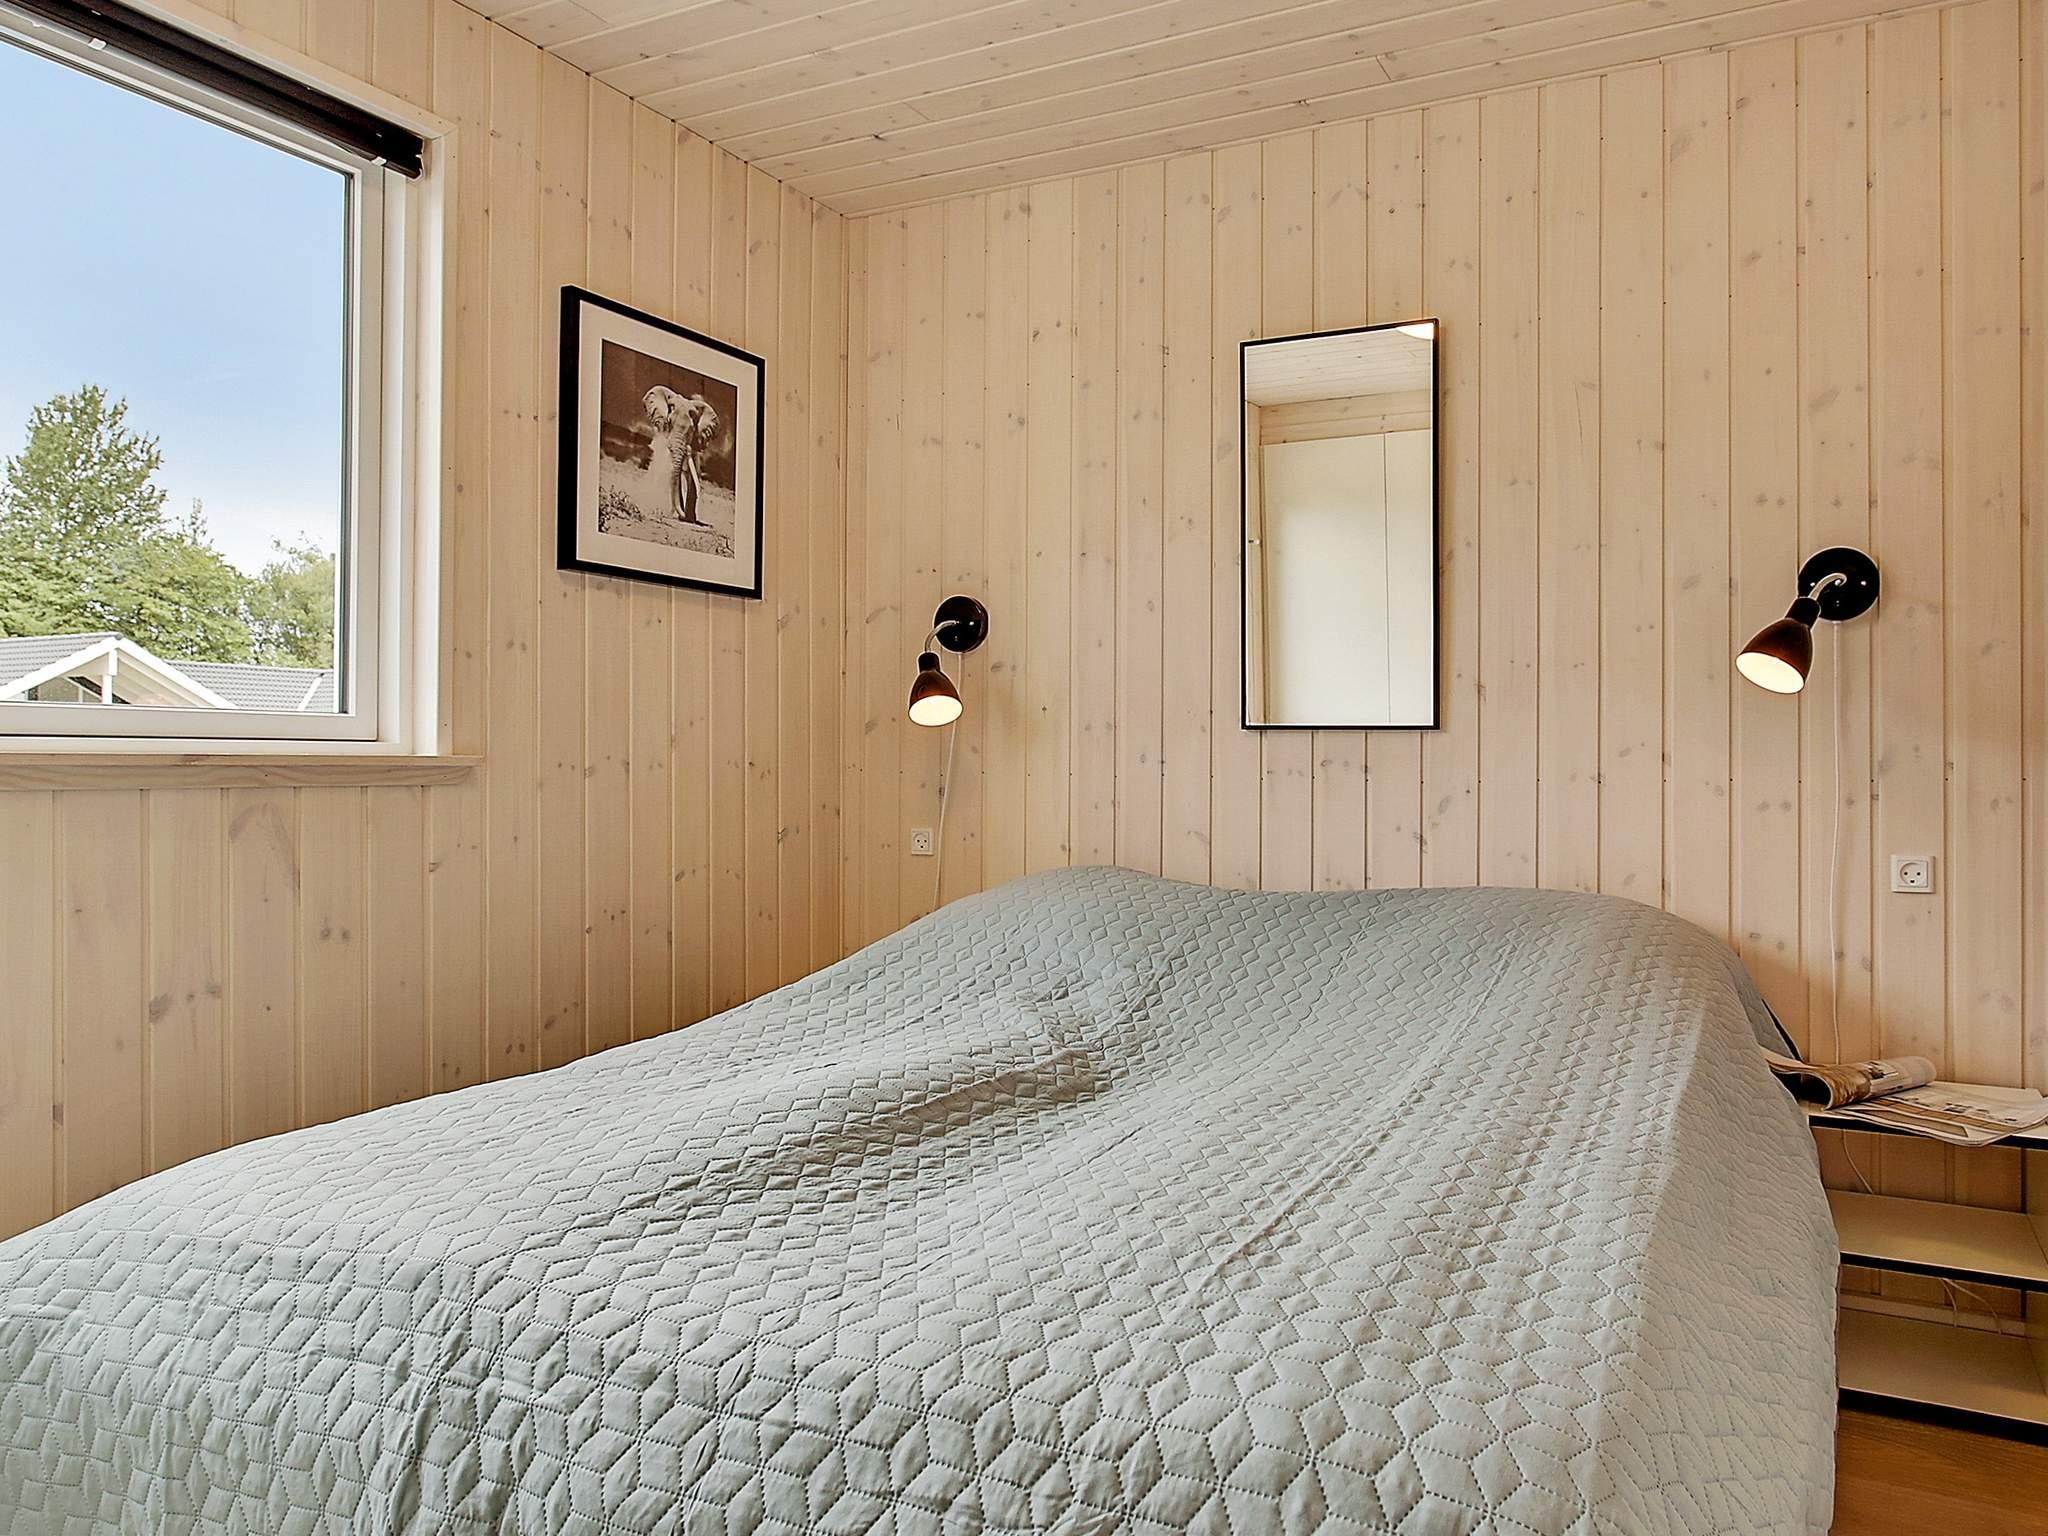 Ferienhaus Vejby Strand (2032832), Vejby, , Nordseeland, Dänemark, Bild 7